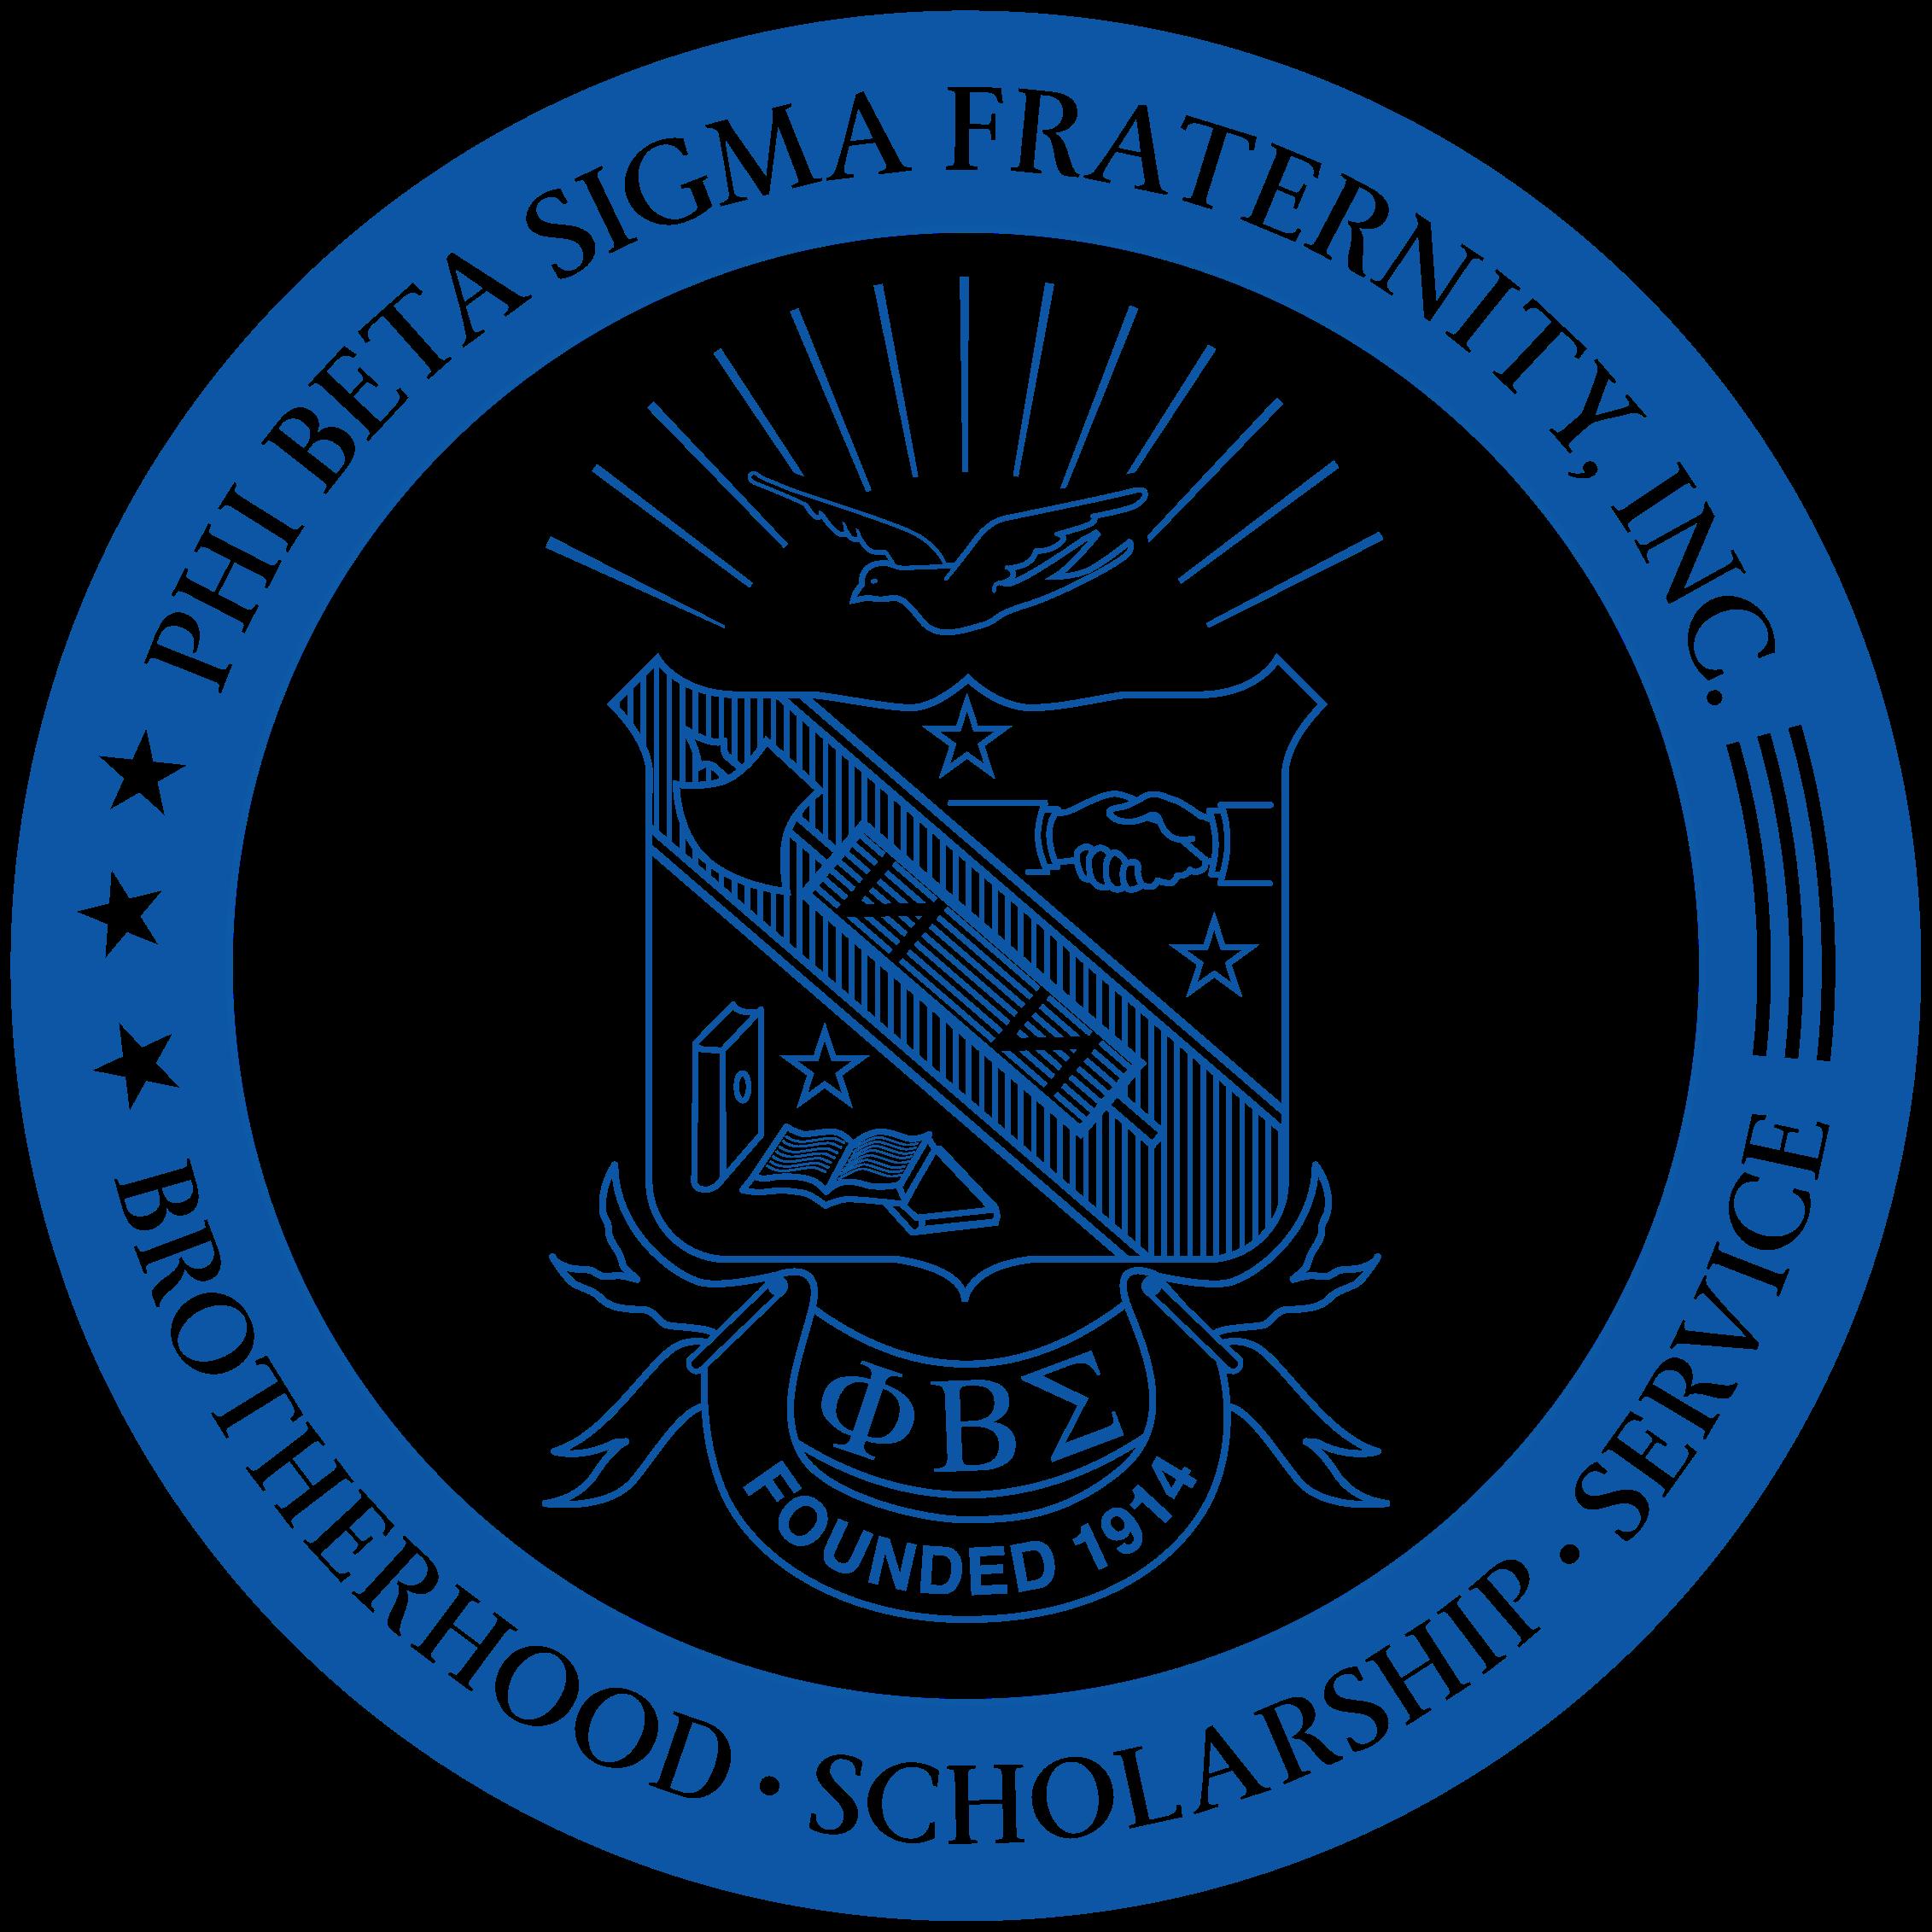 Download Phi Beta Sigma Shield Png () png images.